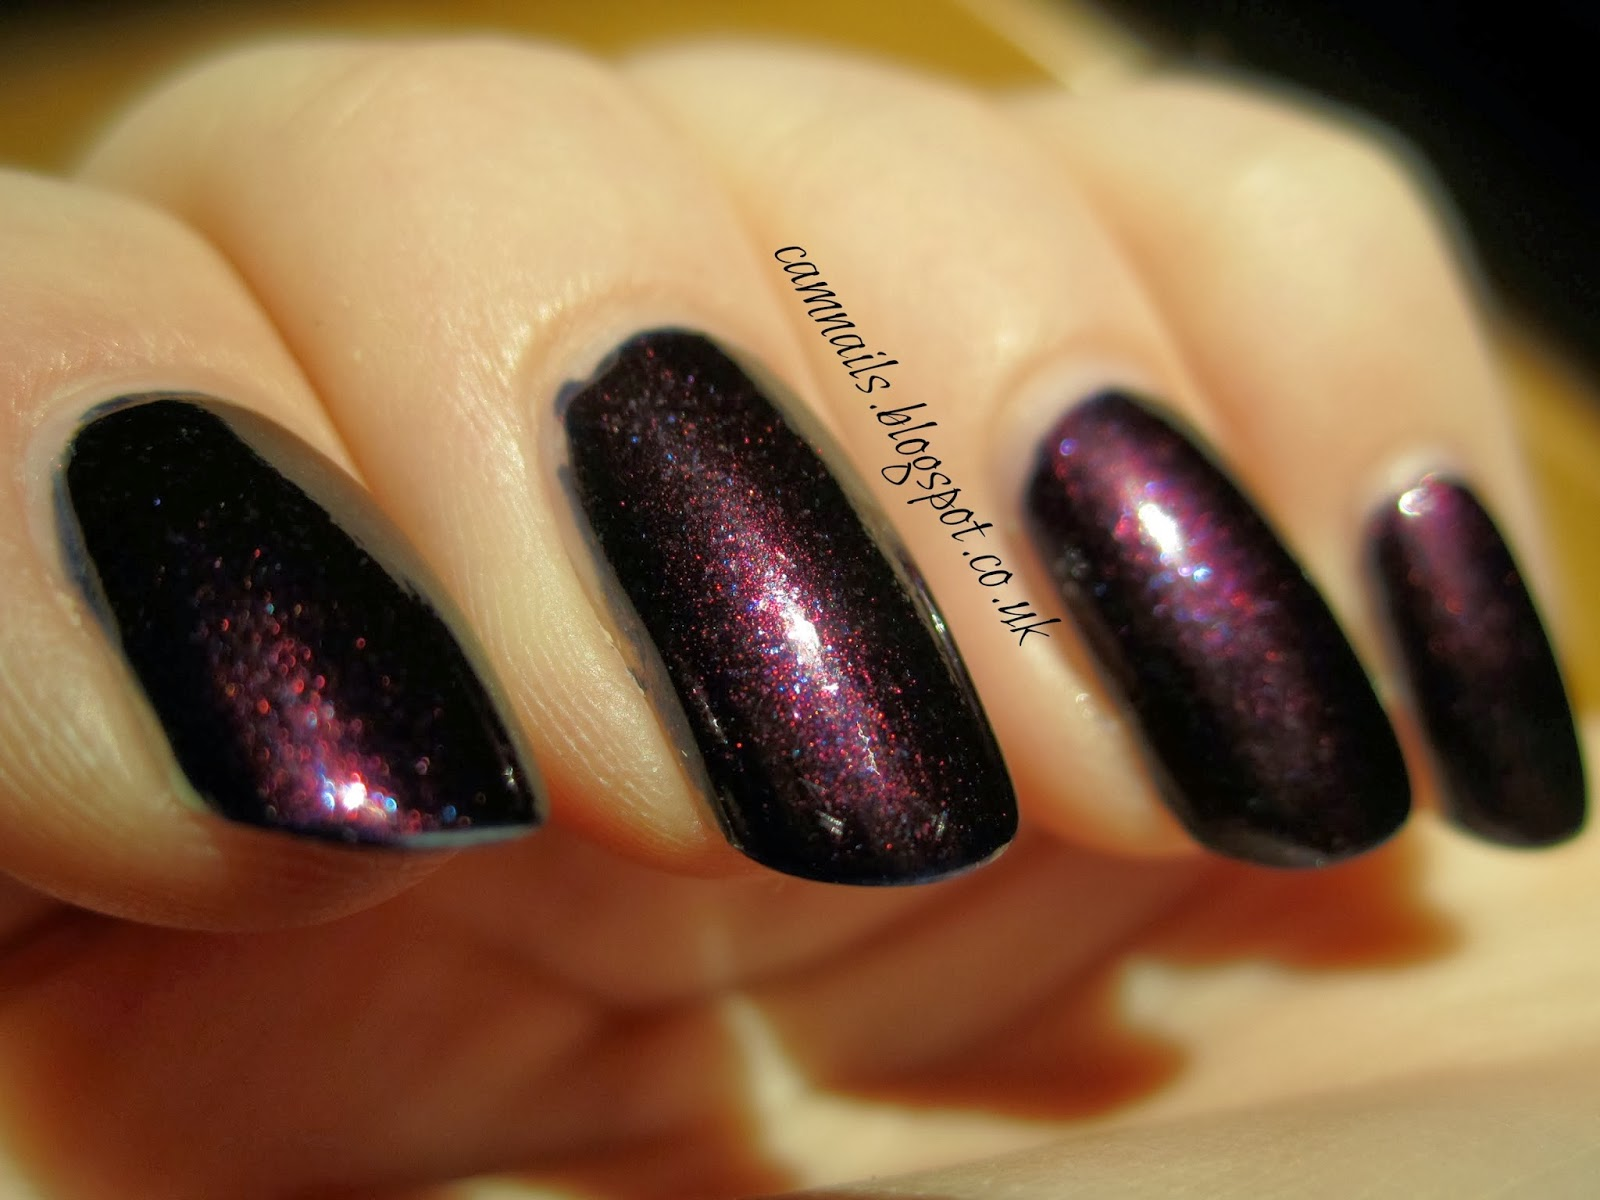 Cambridge Nails: No 7 Galaxy, The Chanel dupe